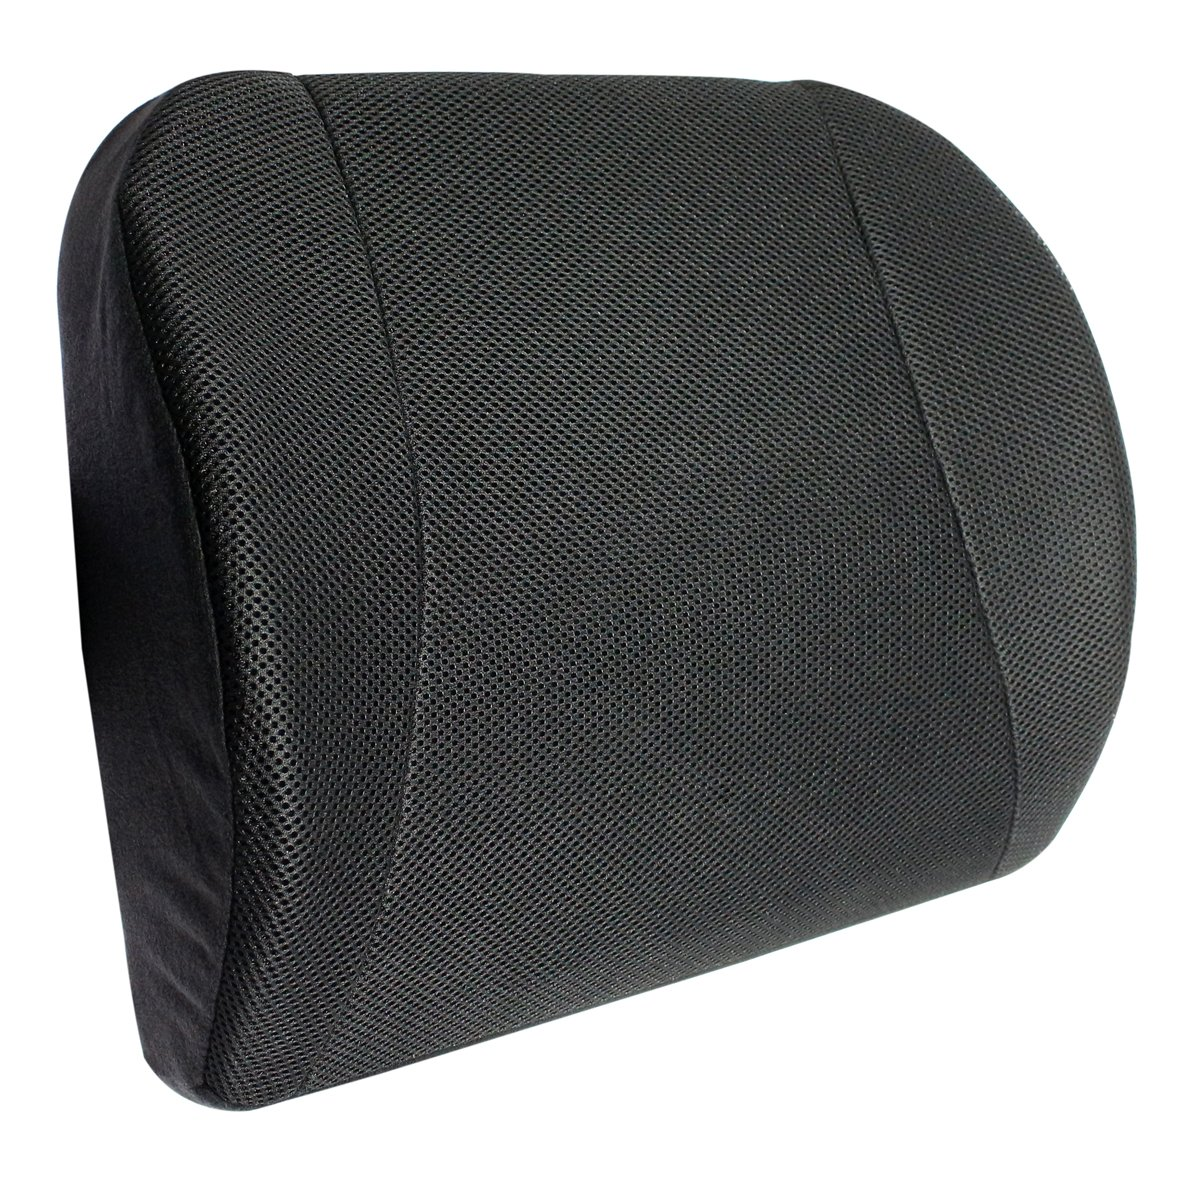 Bamboo Charcoal Memory Waist Cushion Back Lumbar Support- Black